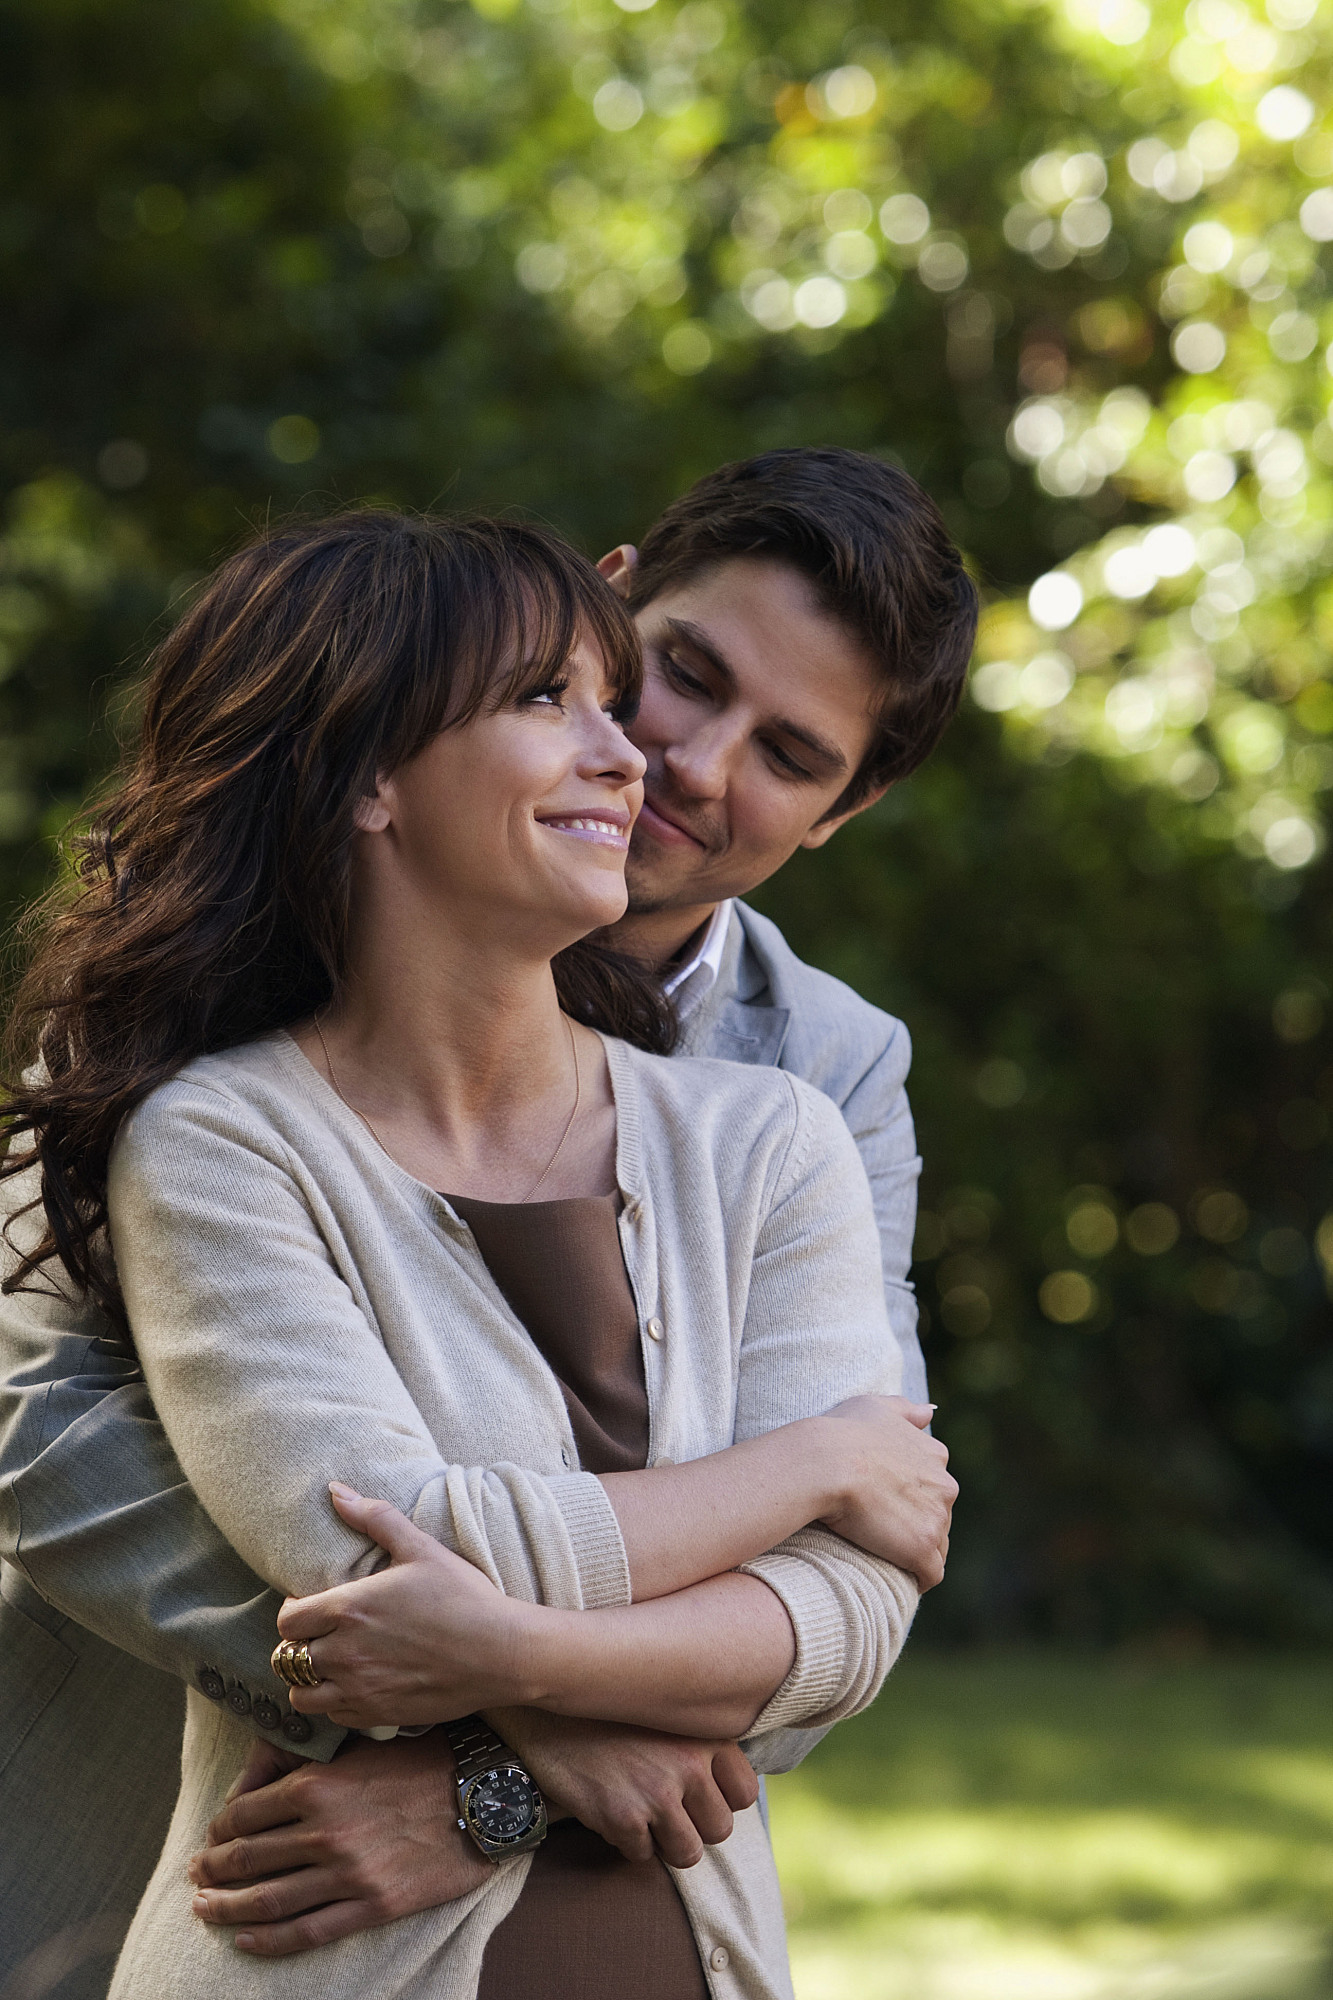 Jennifer Love Hewitt and Sean Faris in The Lost Valentine (2011)